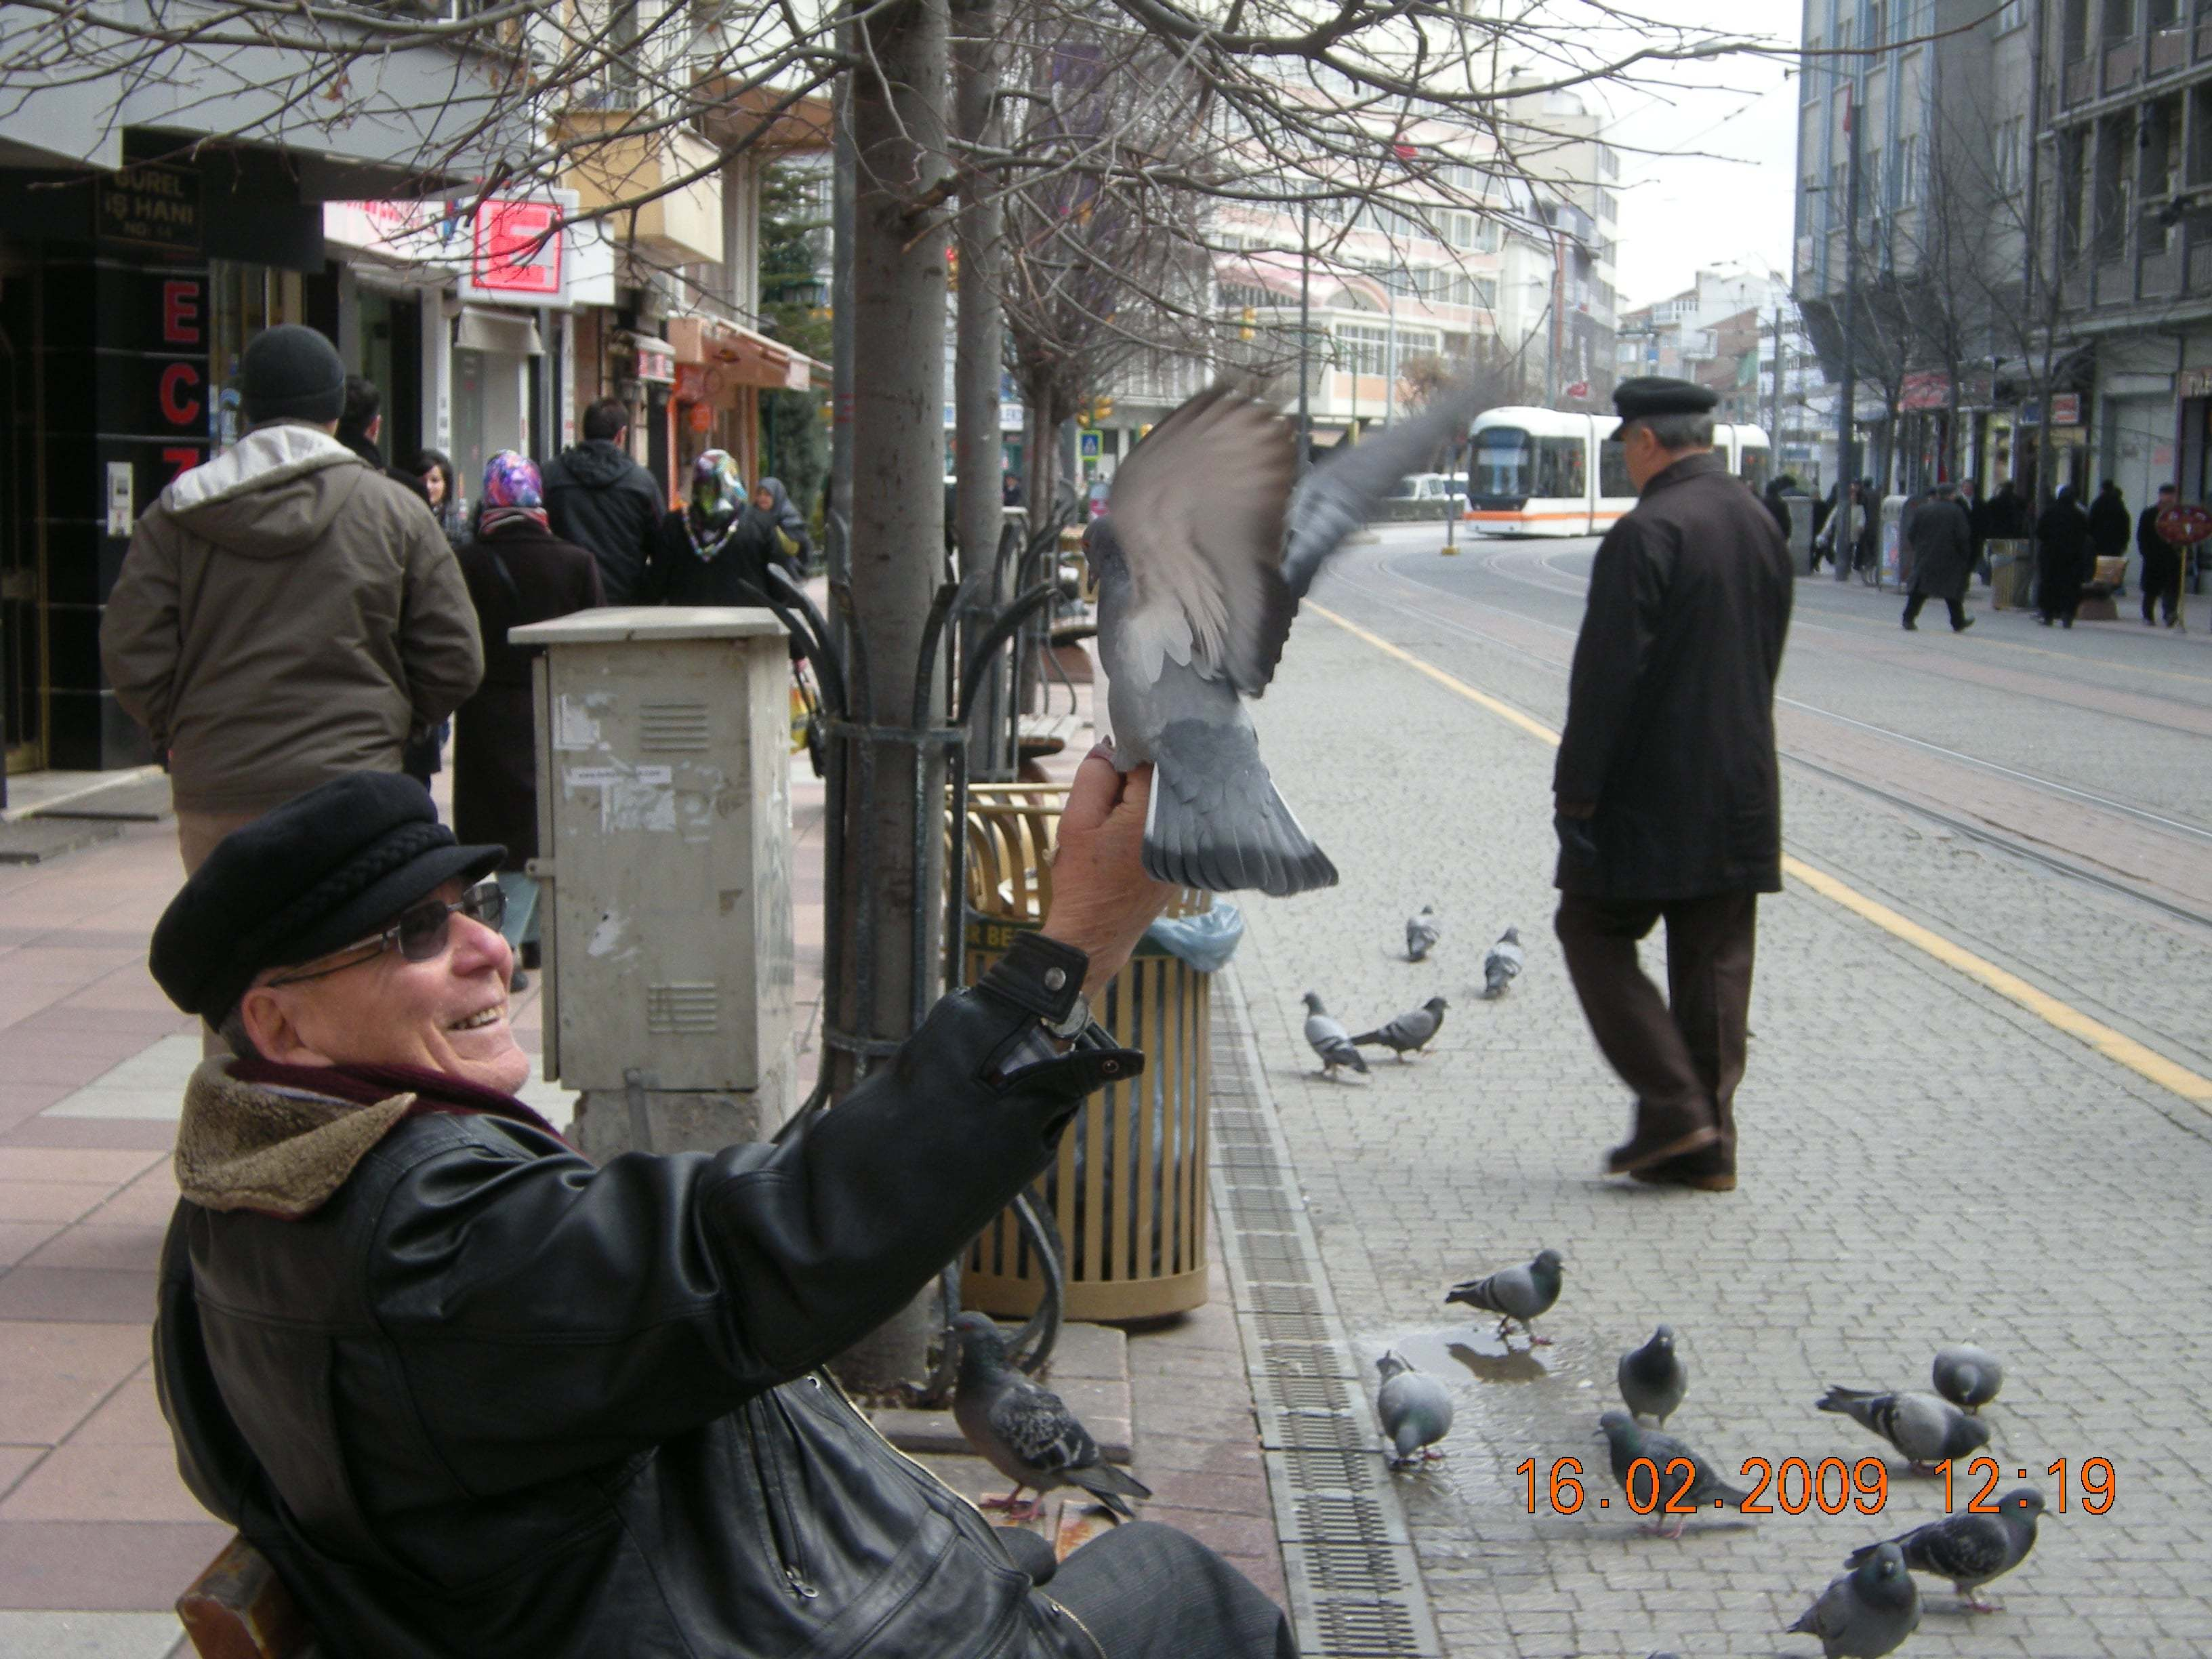 Güvercinlere Yem Veren Adam